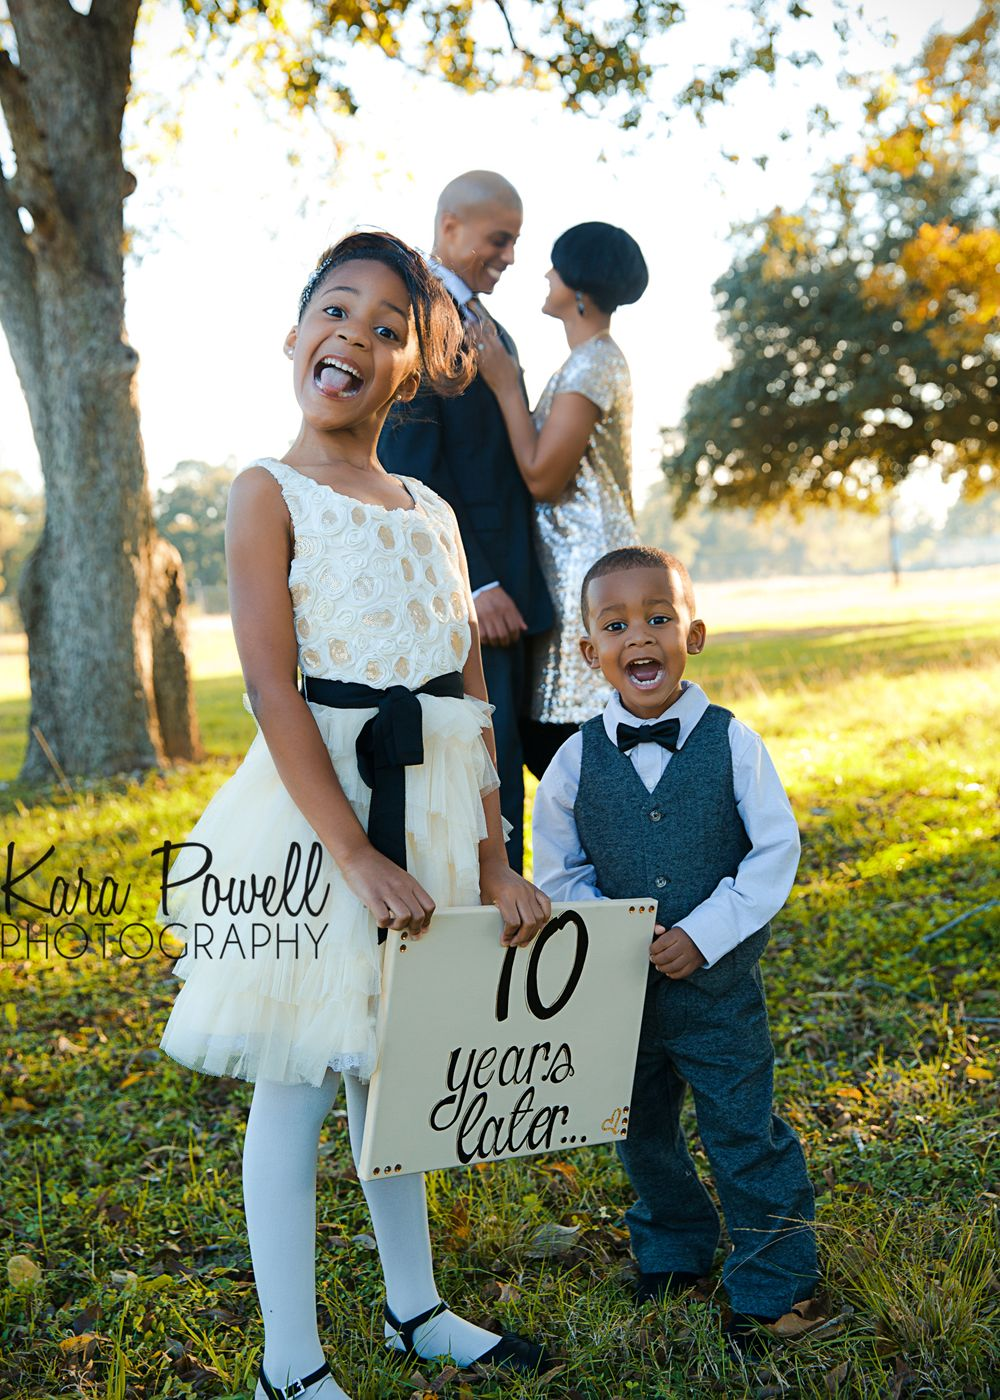 invitations wedding renewal vows ceremony%0A Map Usa Pdf